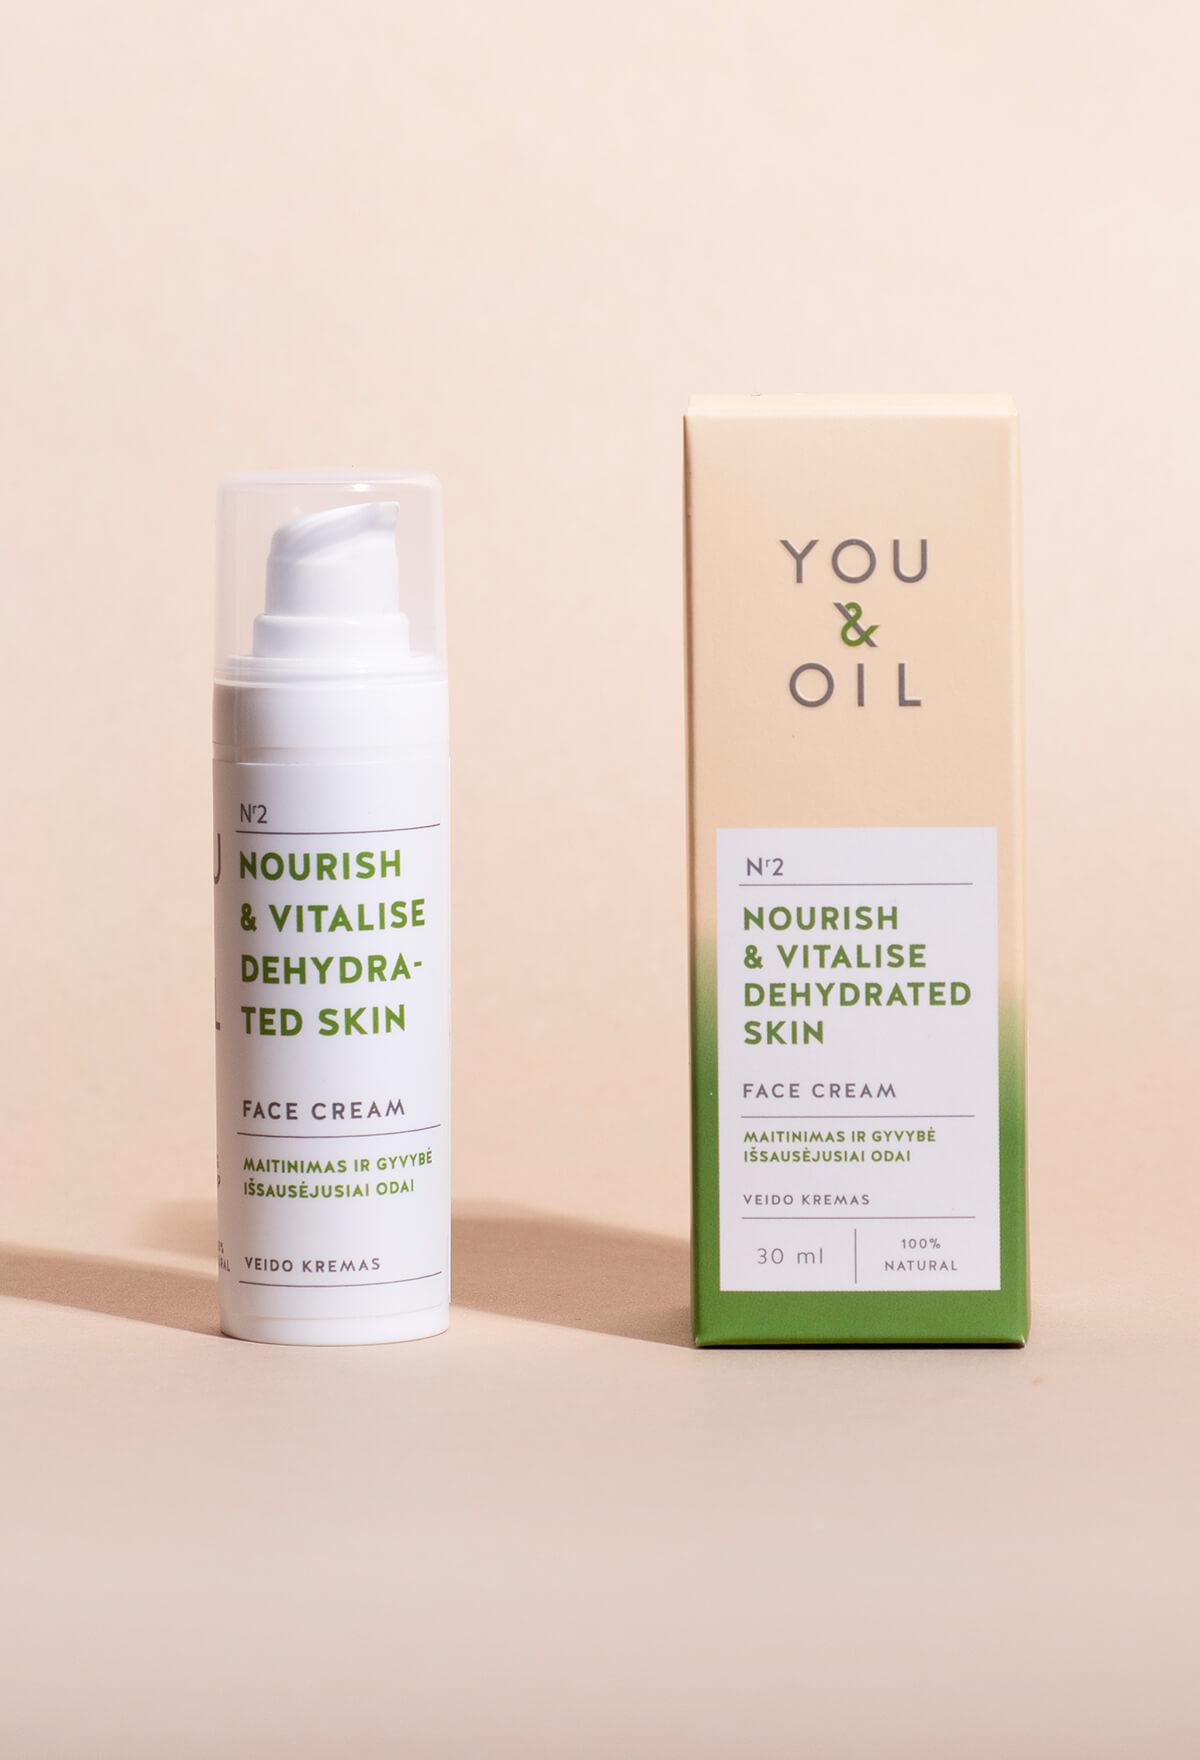 1291Nourish & Vitalise Dehydrated Skin